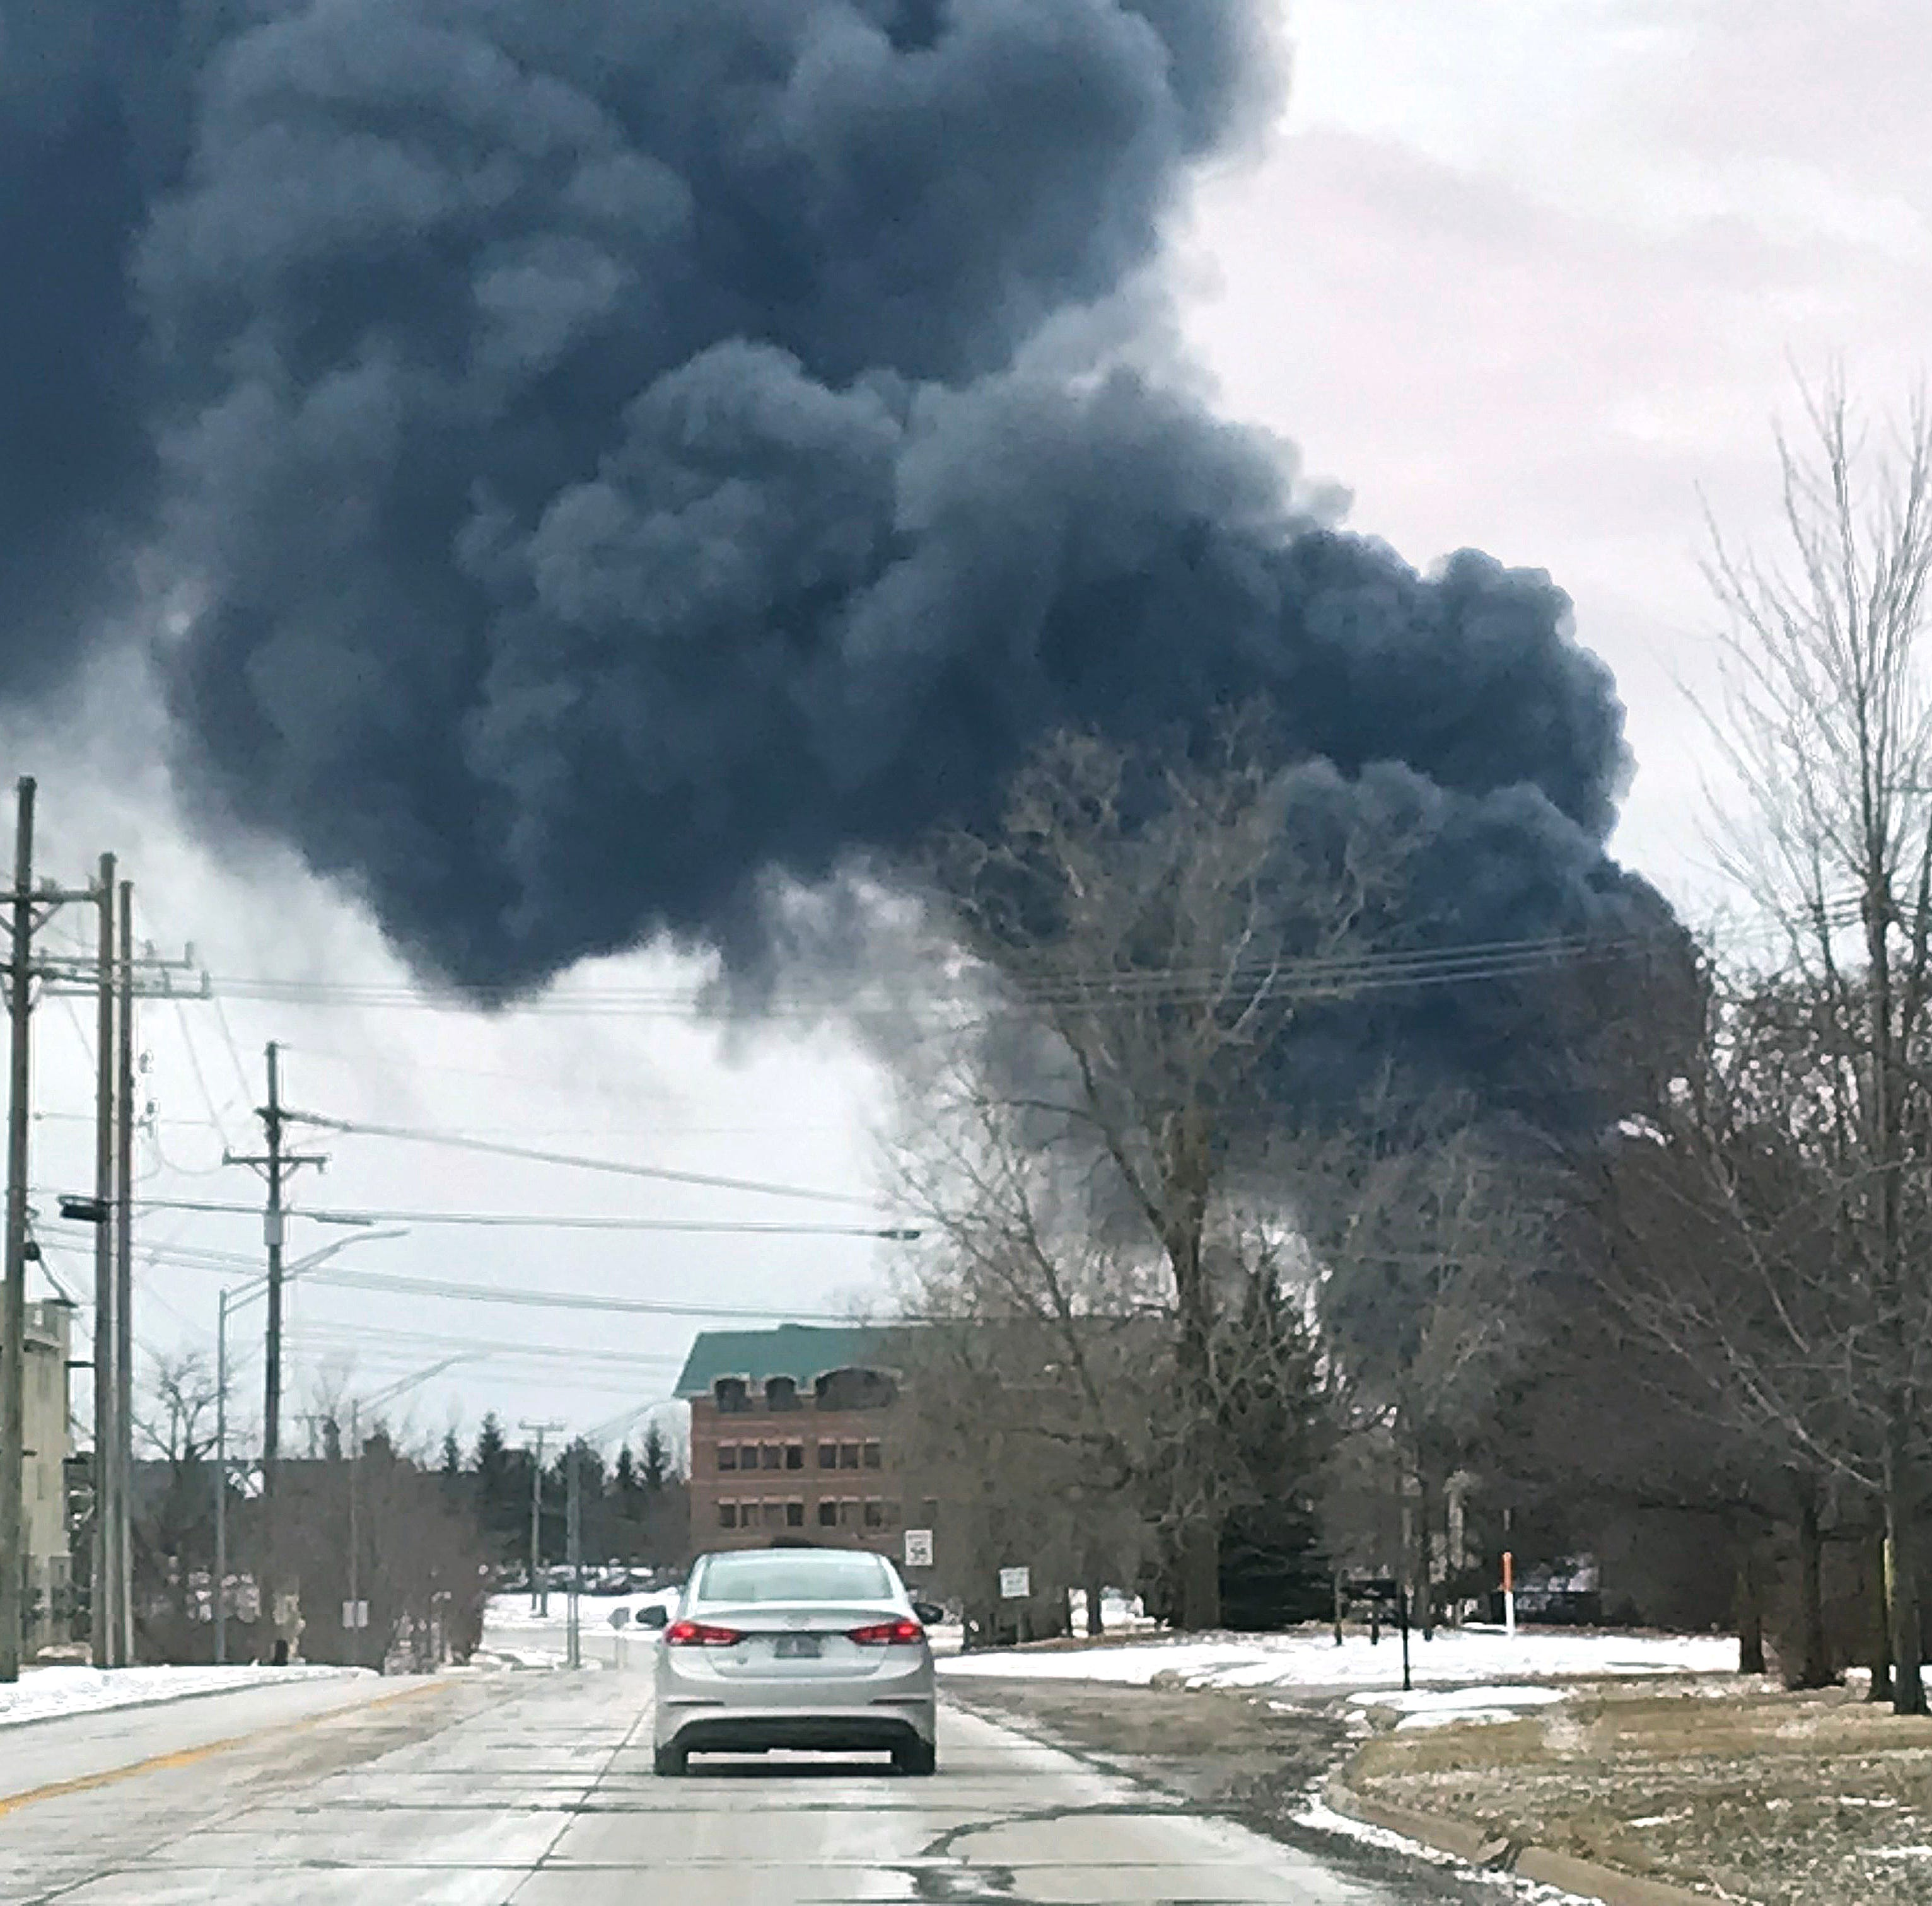 Blaze erupts at Auburn Hills plastics plant